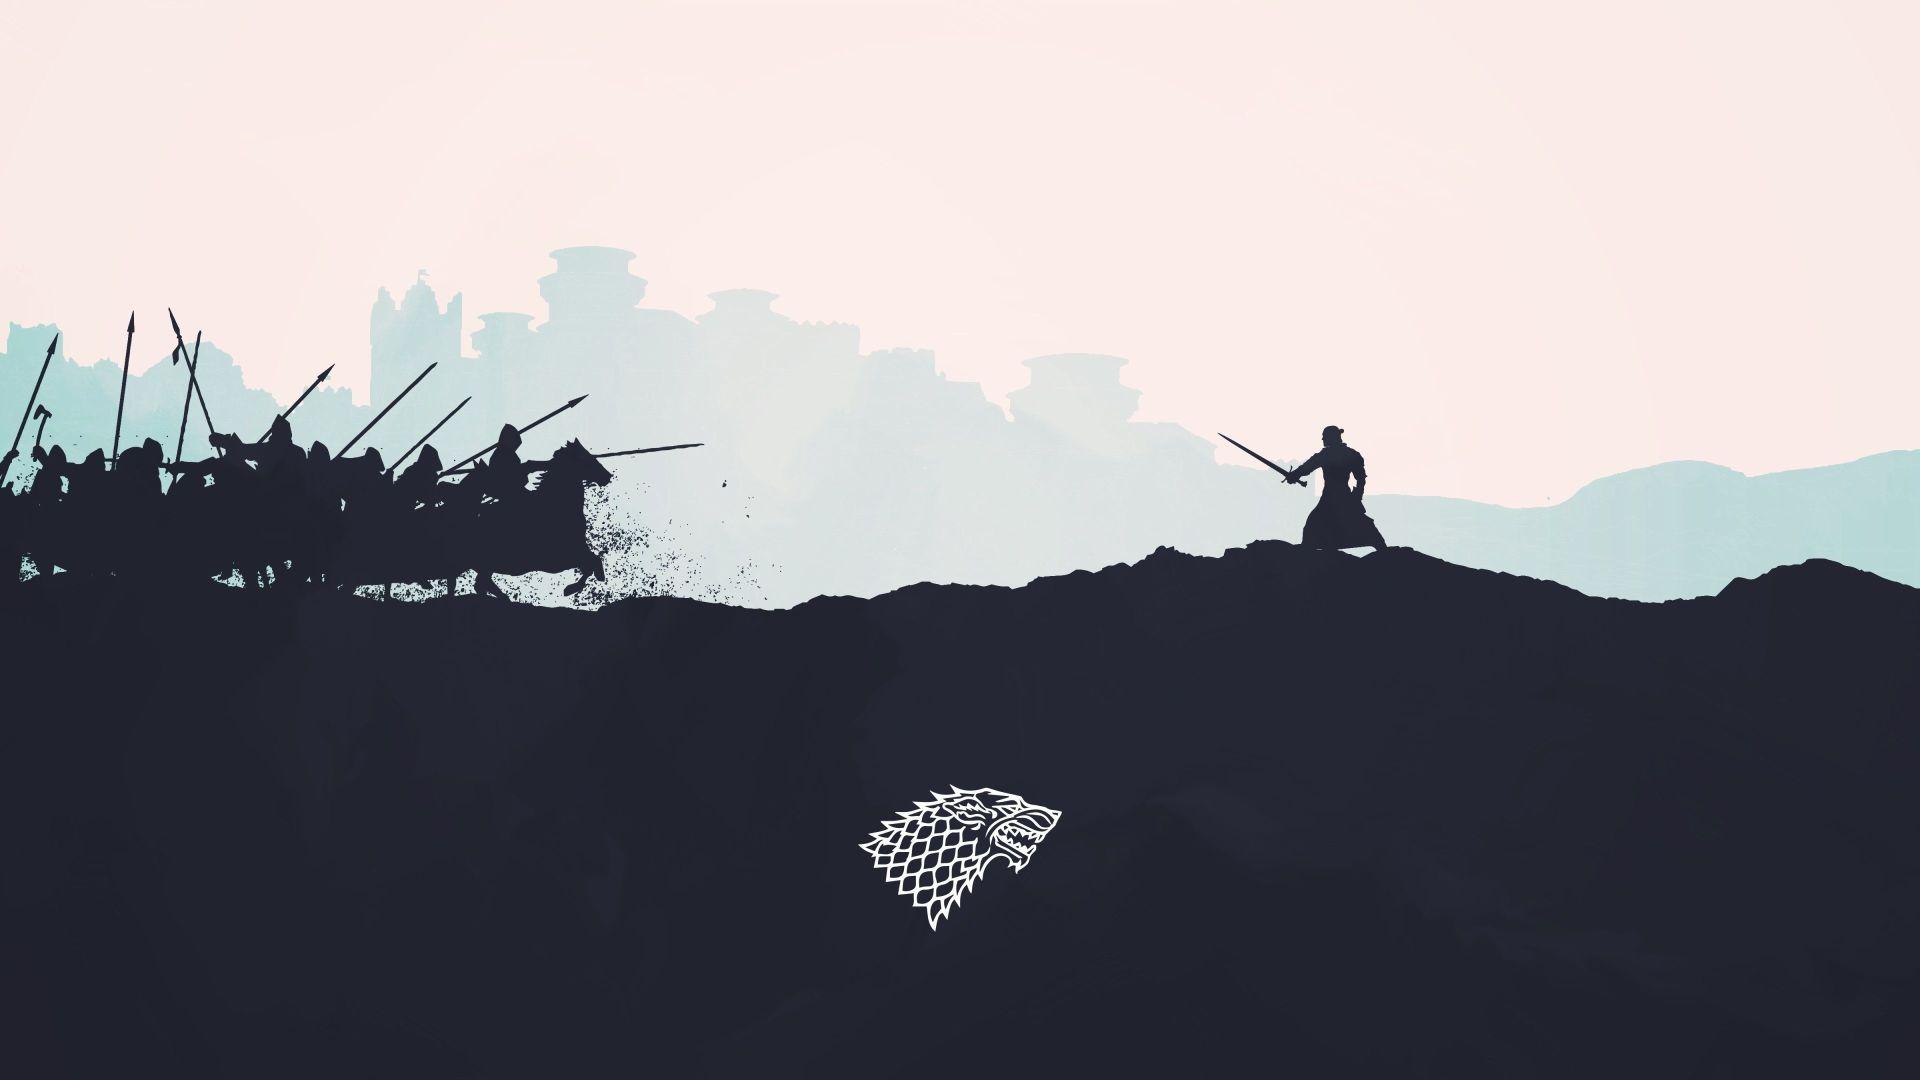 Game of Thrones minimal art